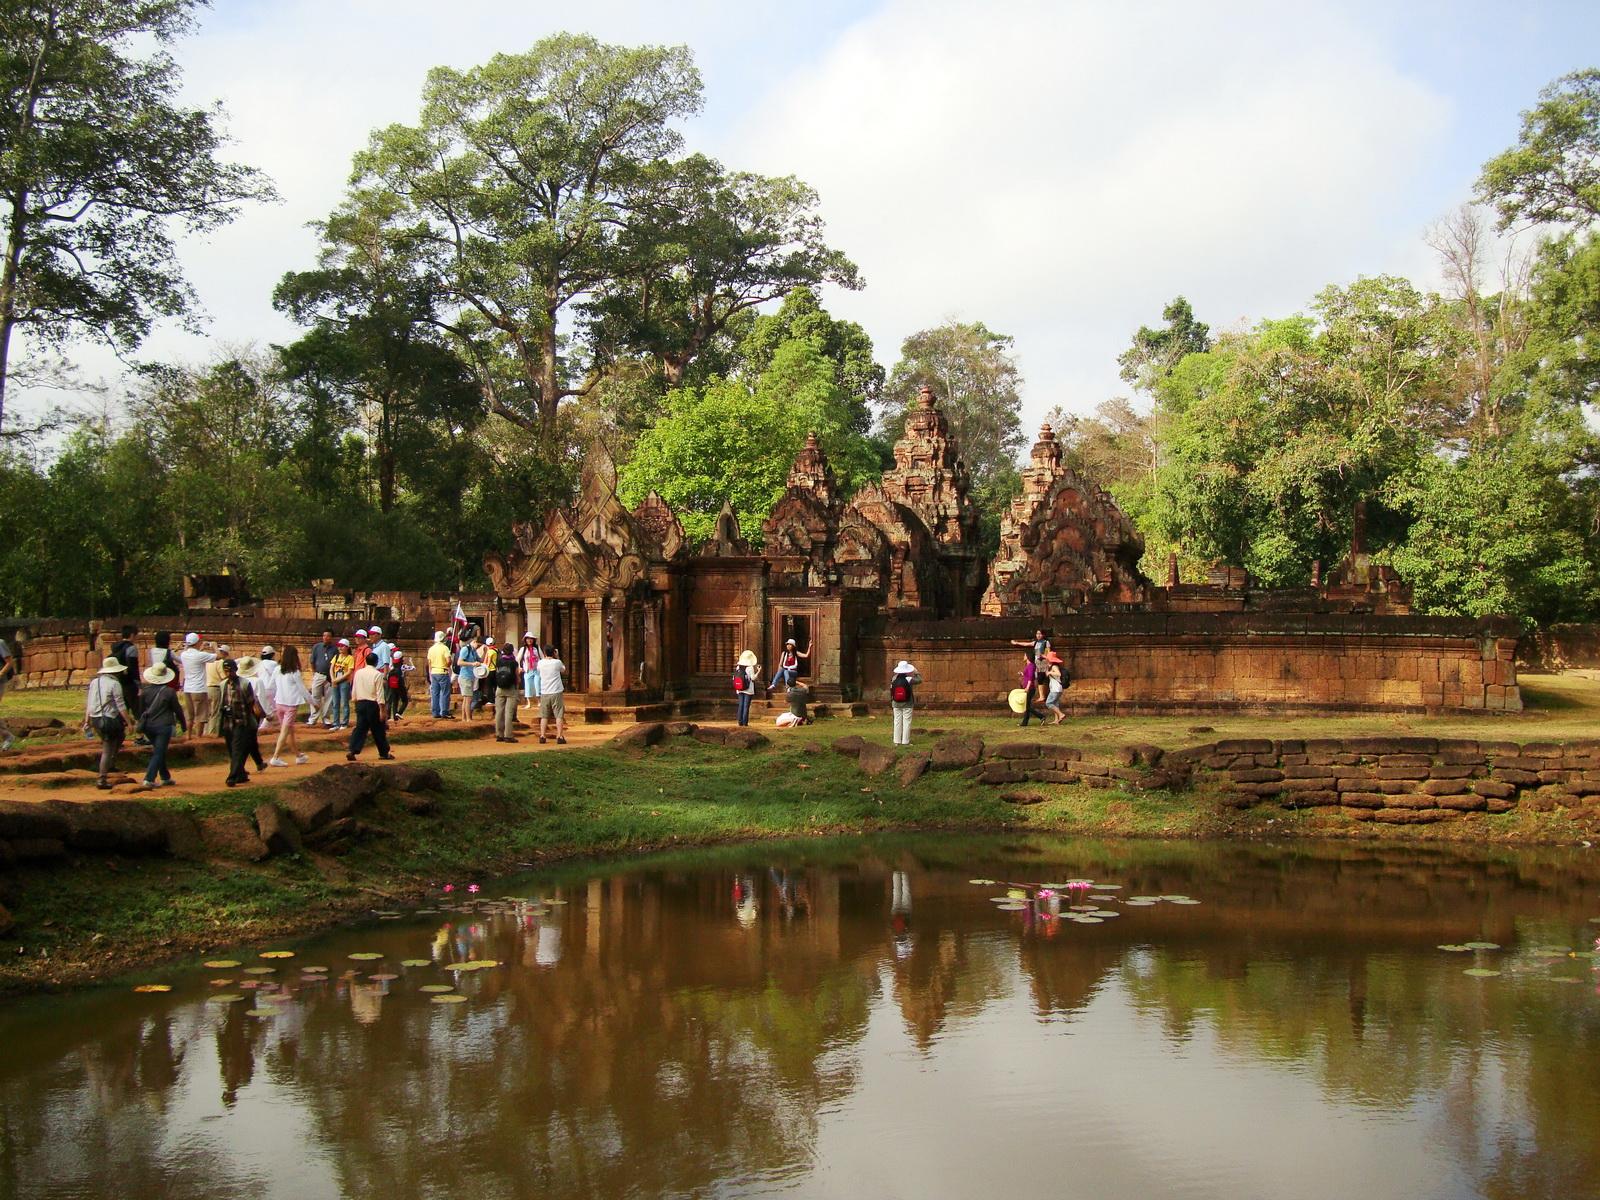 Banteay Srei 10th century Khmer architecture Tribhuvanamahesvara 21